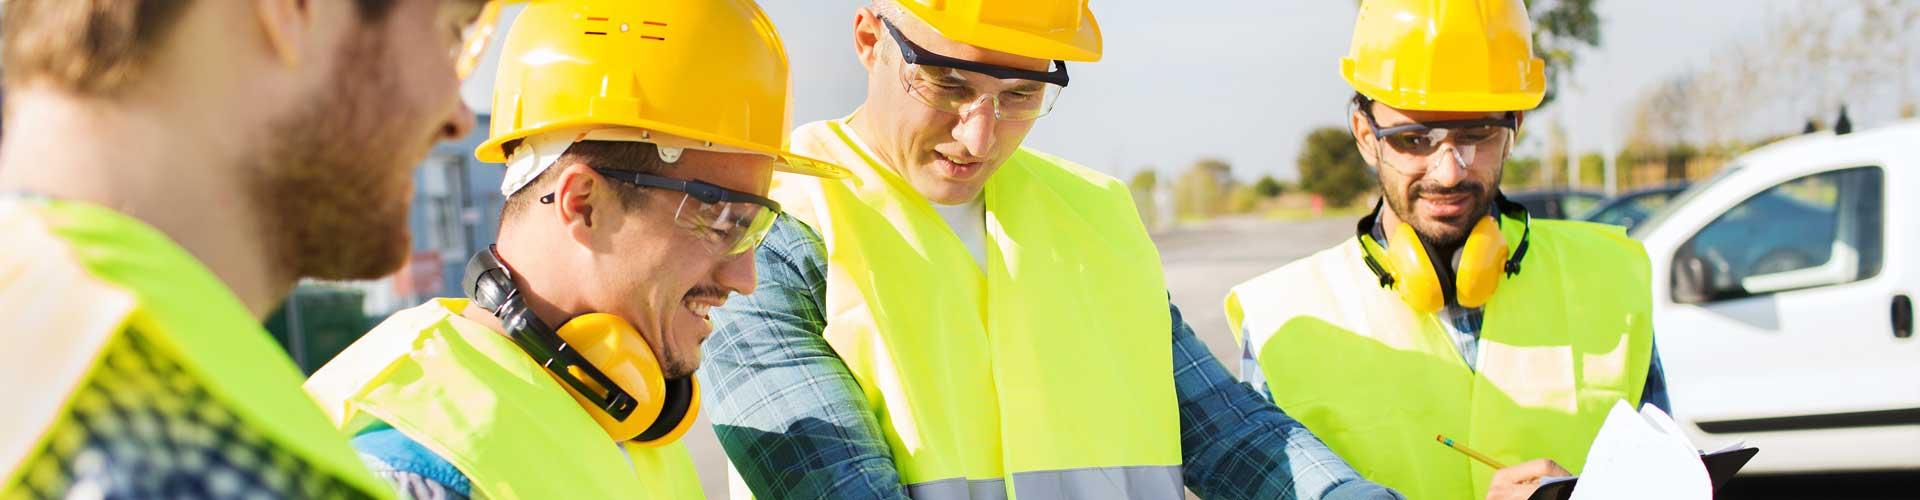 -Contractor Liability Insurance- – Mountain Coastal Insurance, Inc.